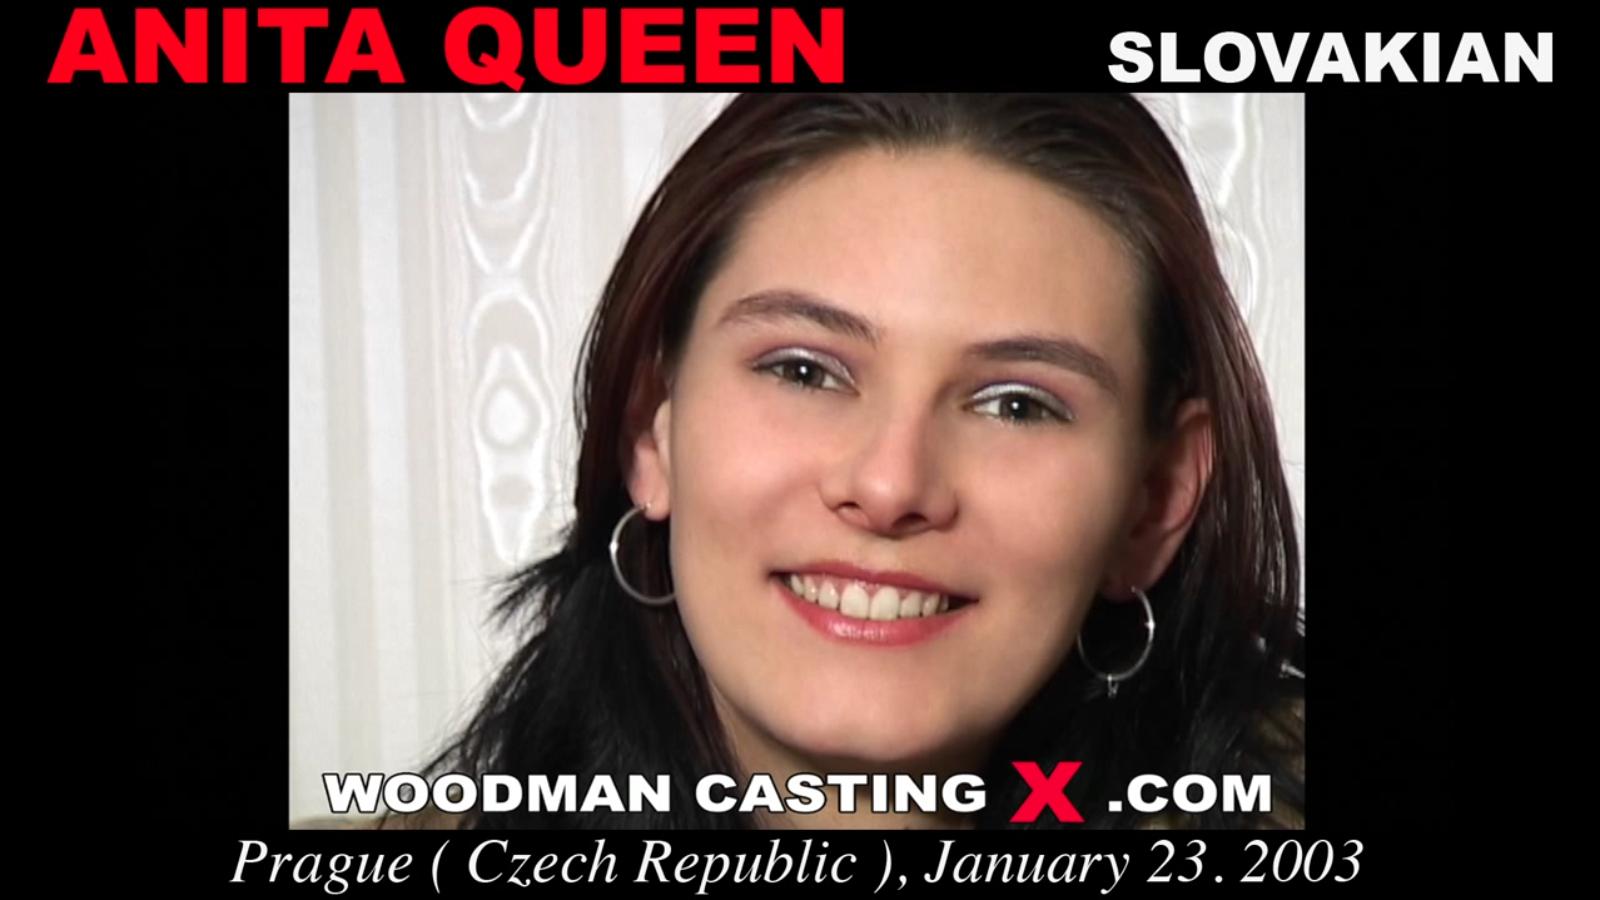 Видео с Лола Реве смотреть онлайн на порно 365.club